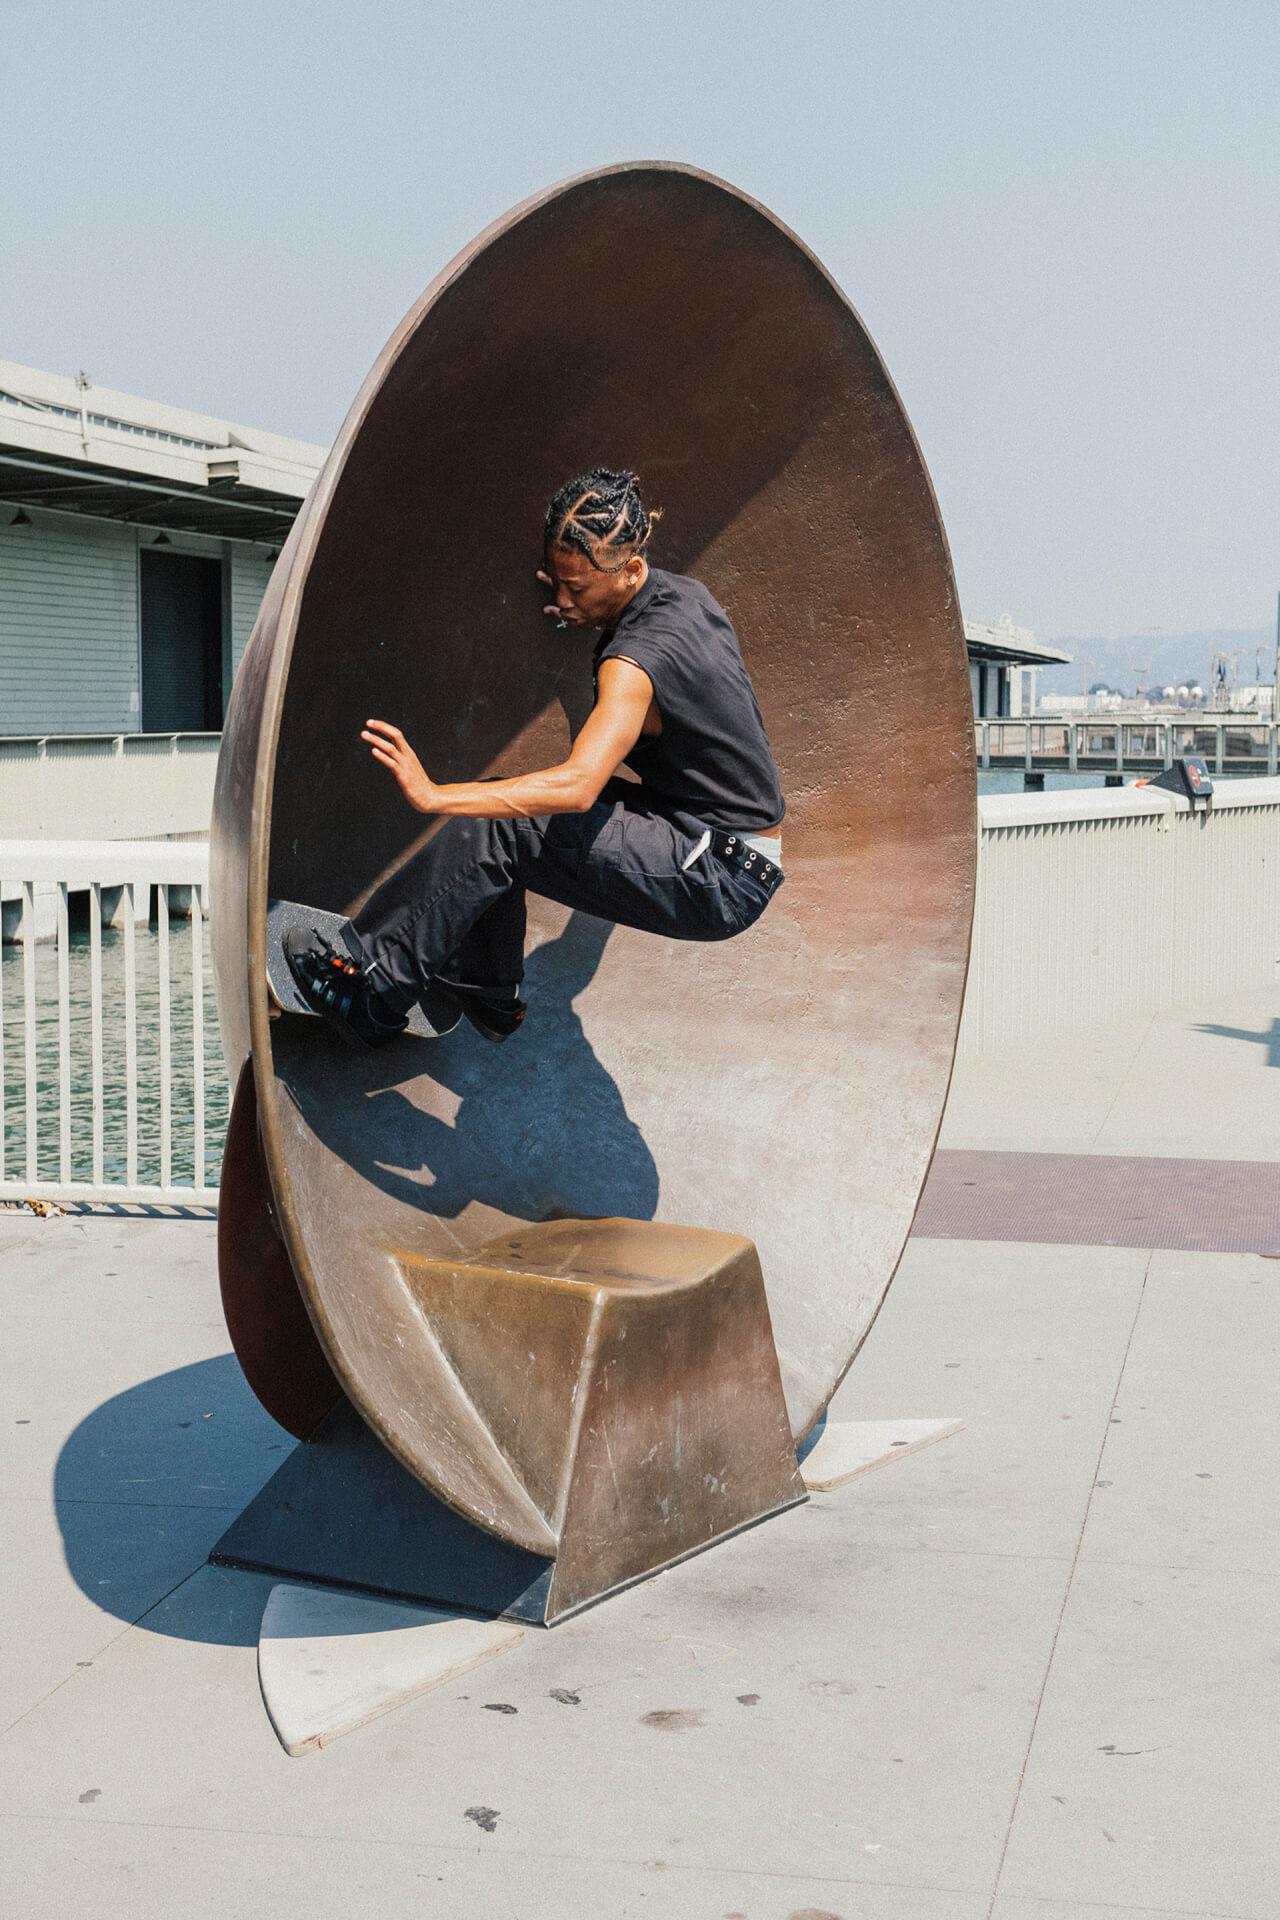 adidas SkateboardingとTHRASHERがコラボ!プロスケーターTyshawn Jonesのシグネチャーモデル&新型SUPERSTARが登場 life201126_adidas_skateboarding_7